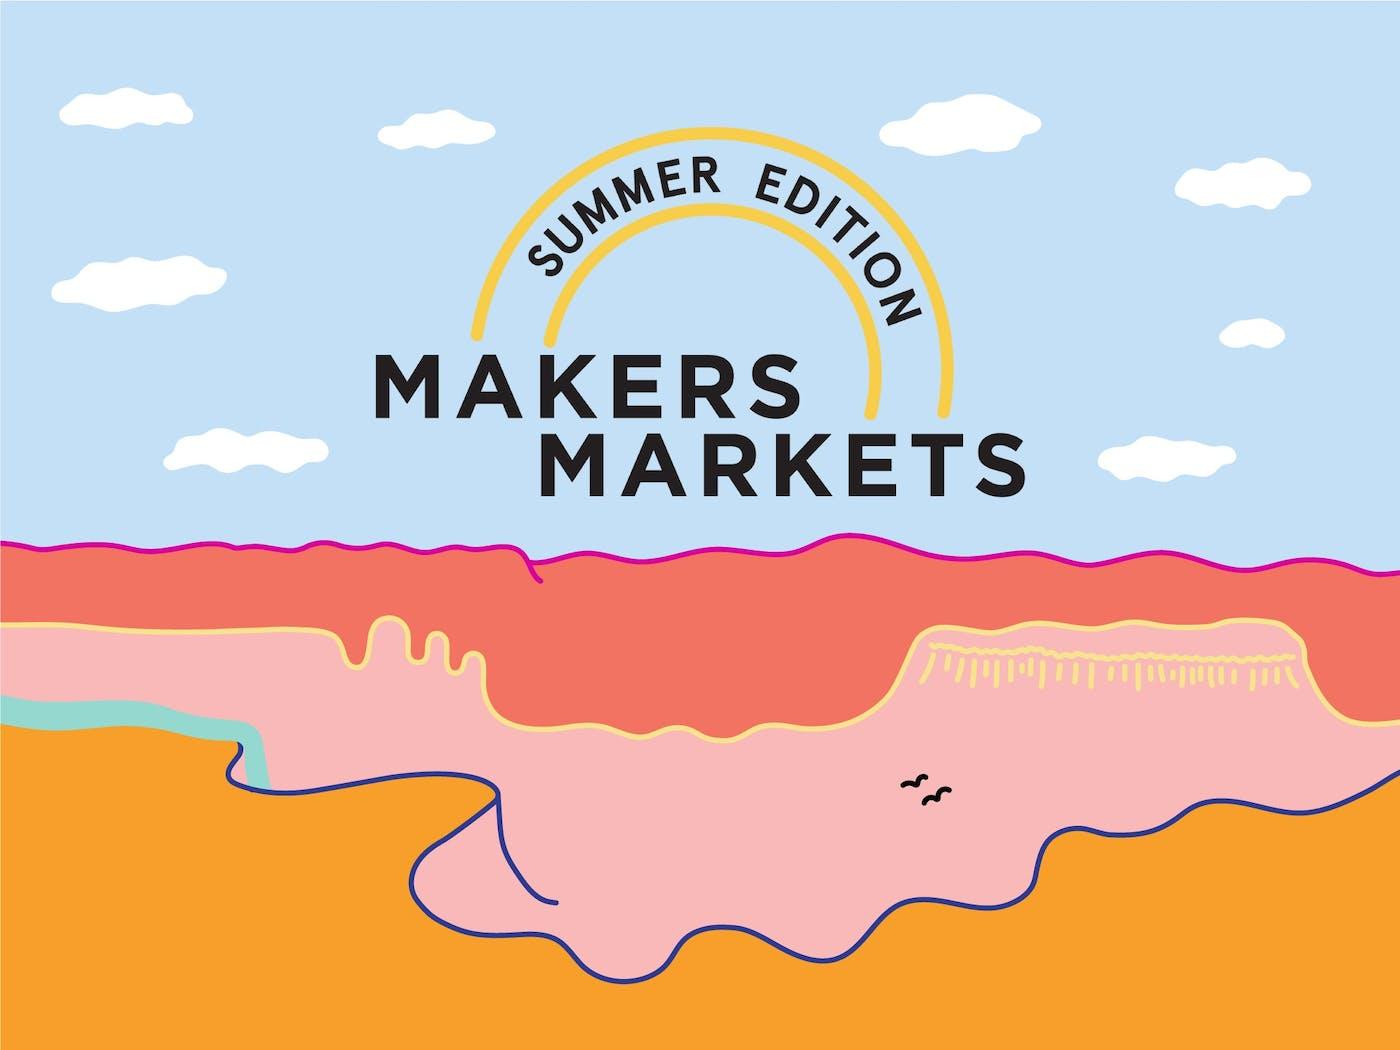 Makers Markets – Summer Edition